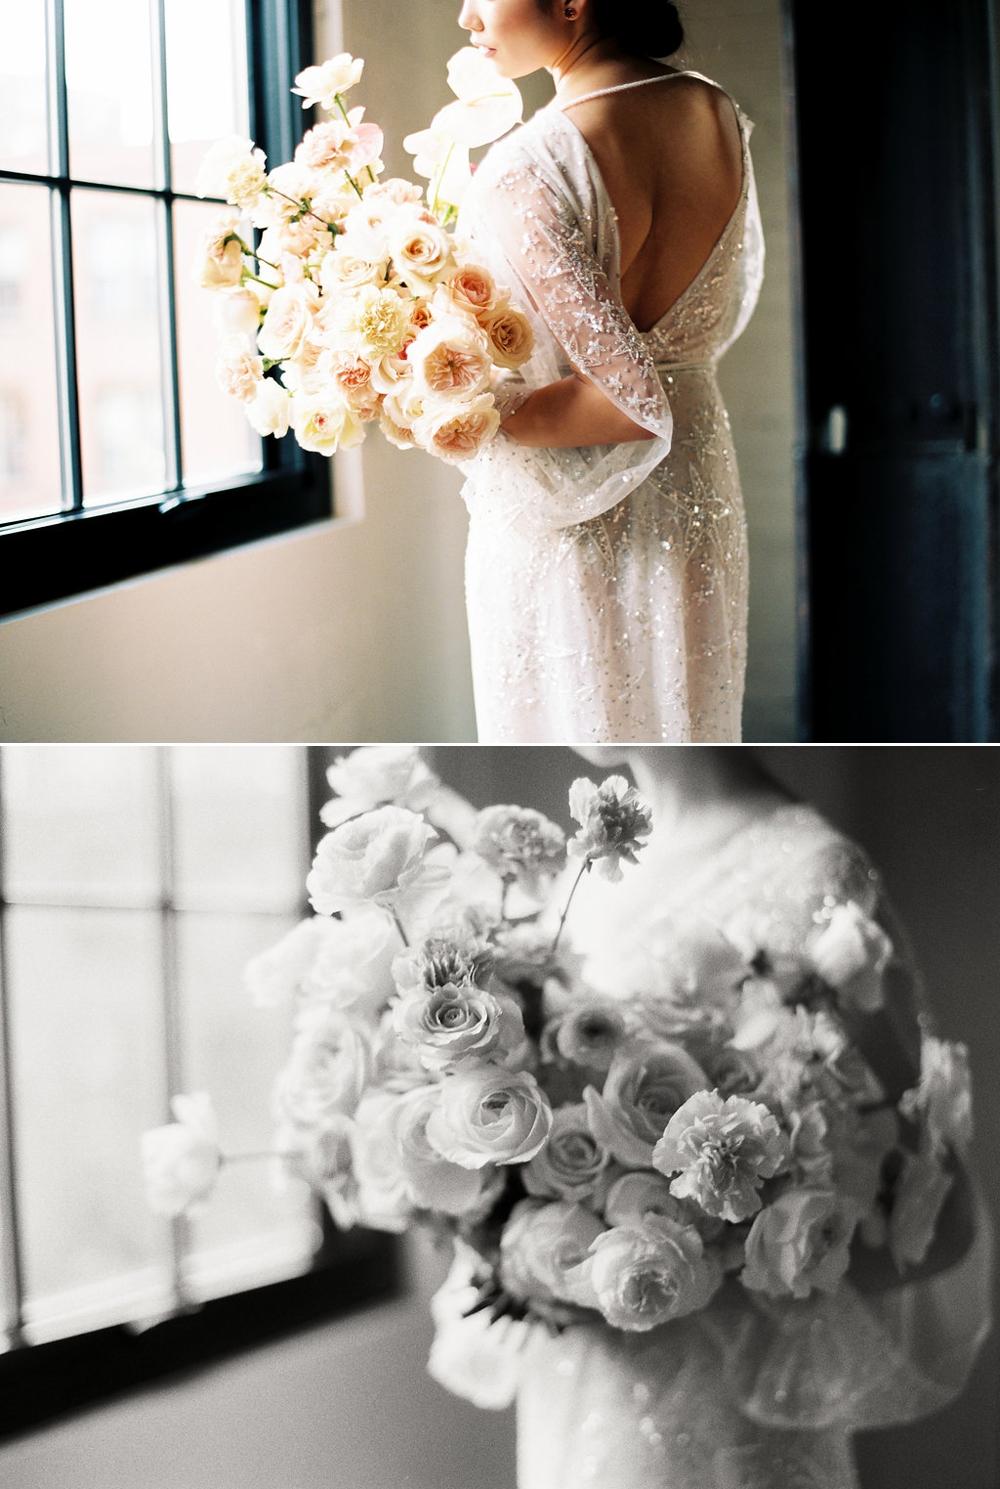 editorial-session-seattle-flower-stylist 23.jpg